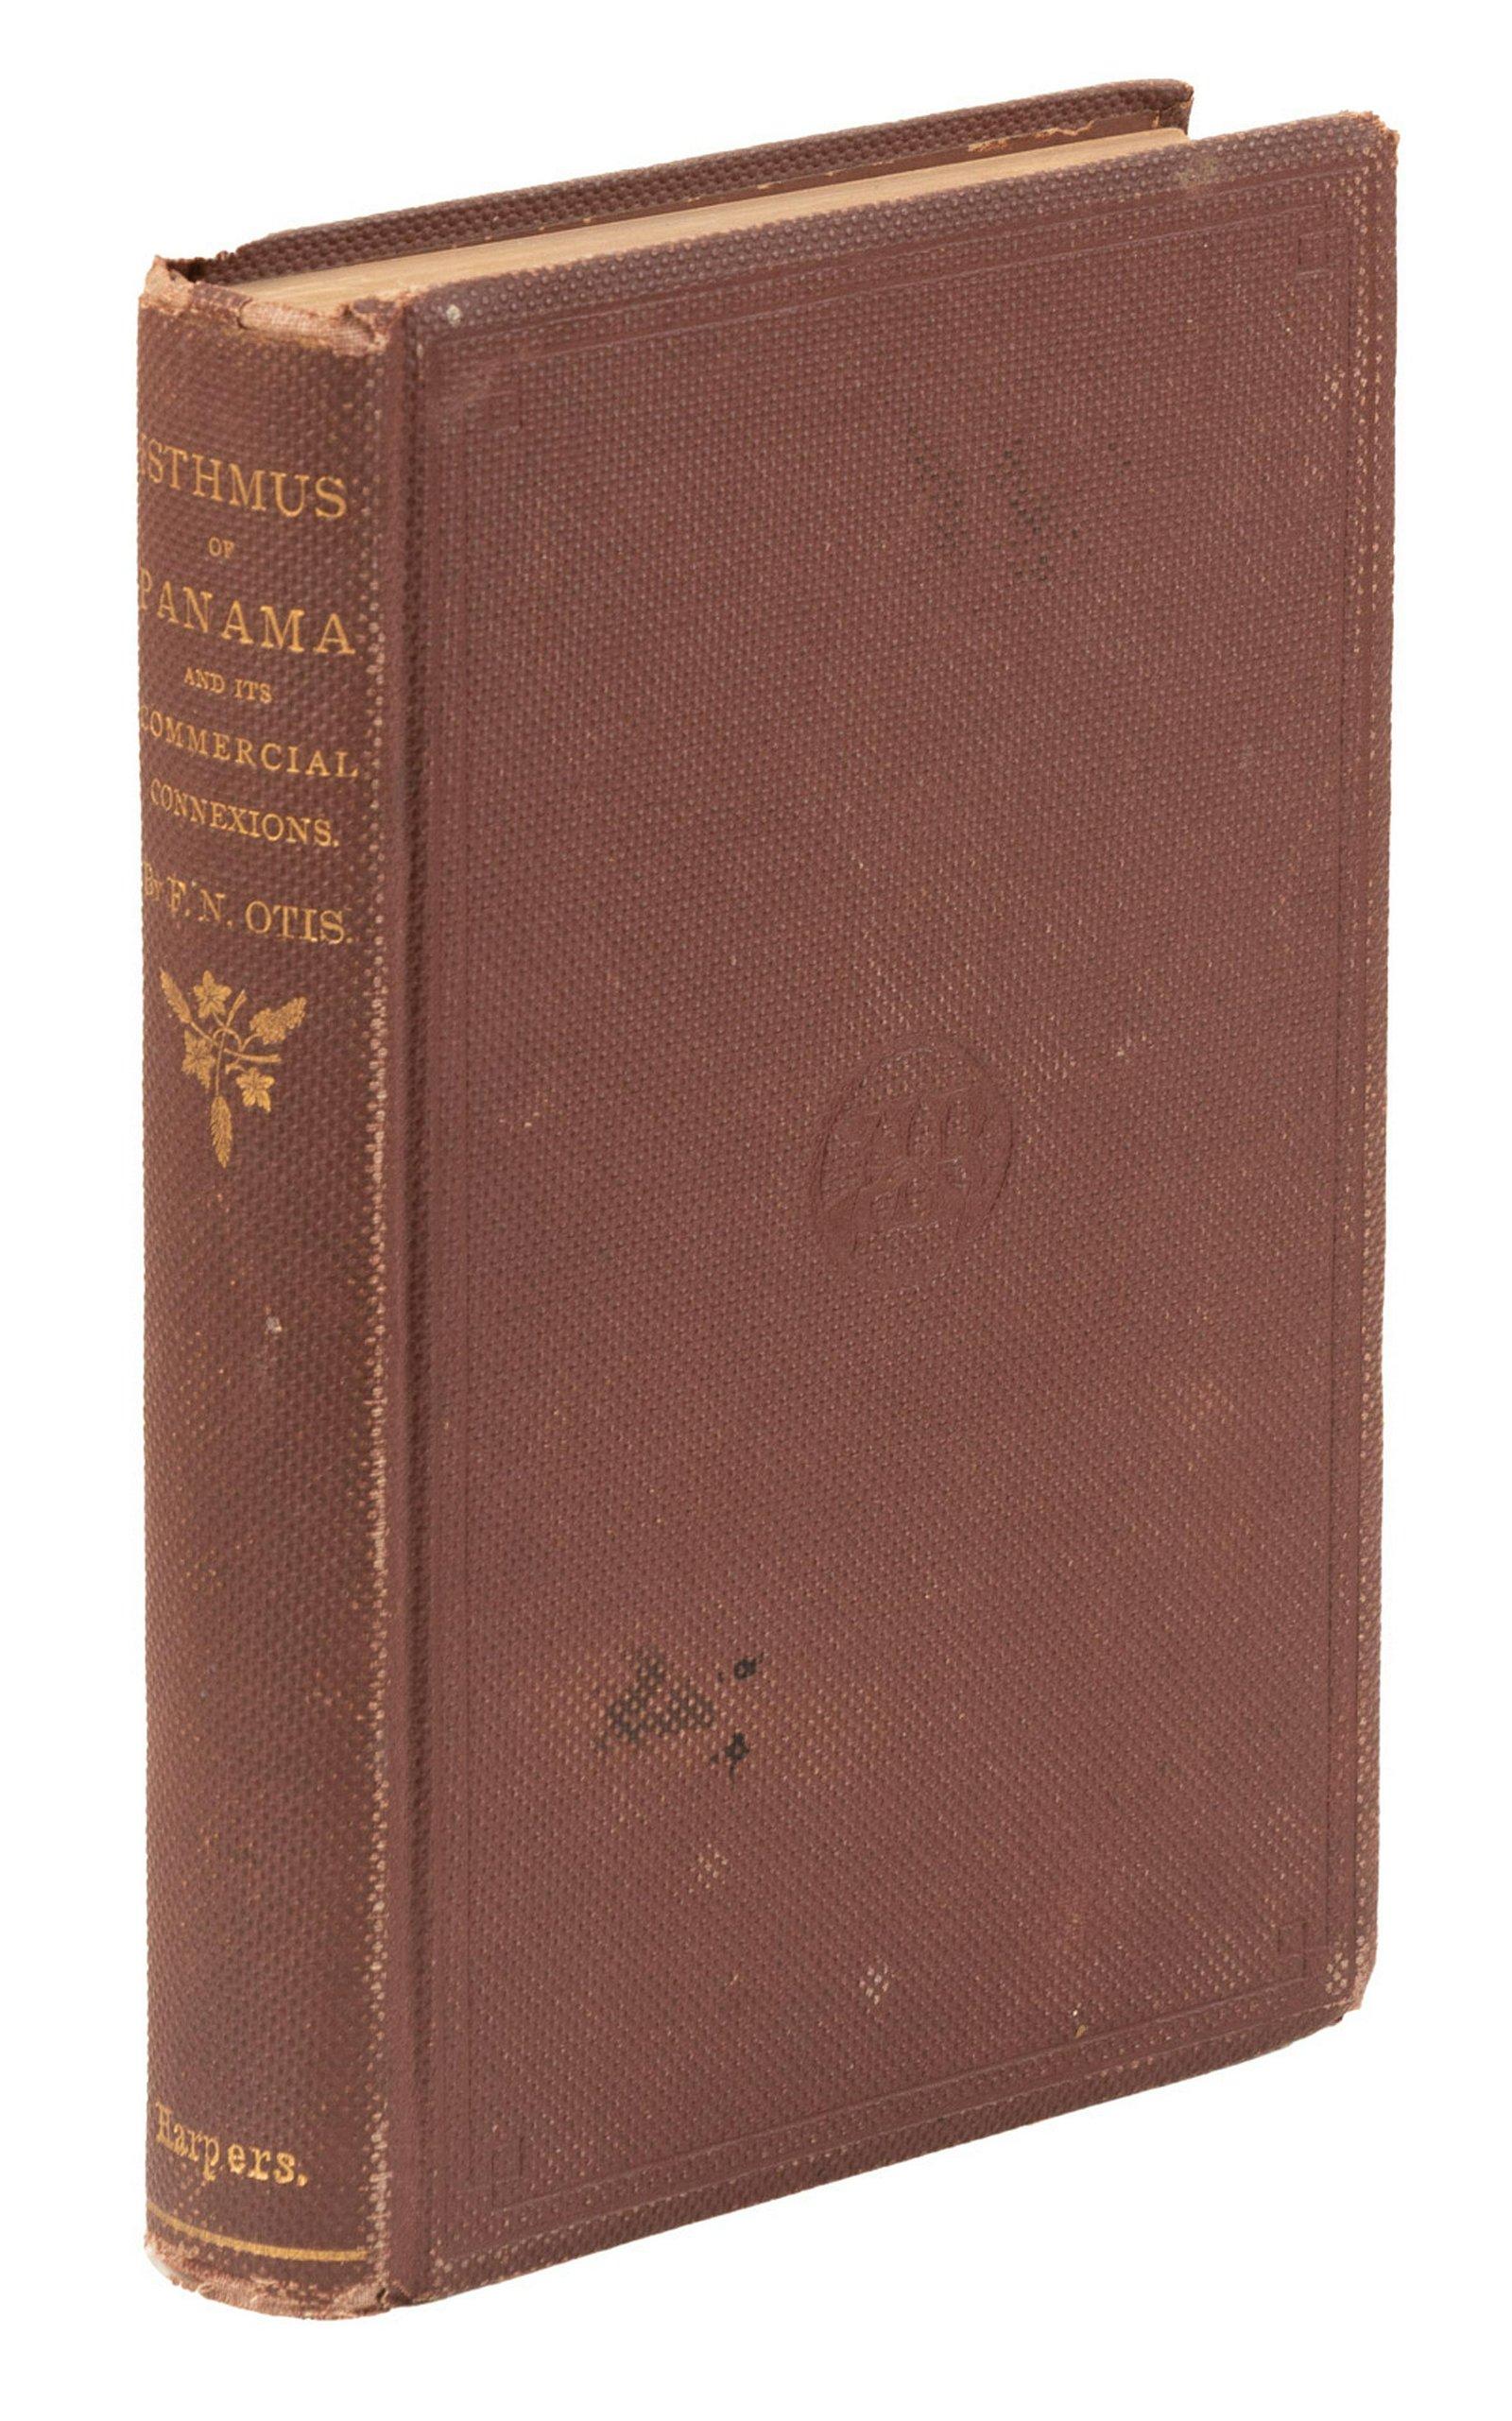 History of Panama Railroad with historic association